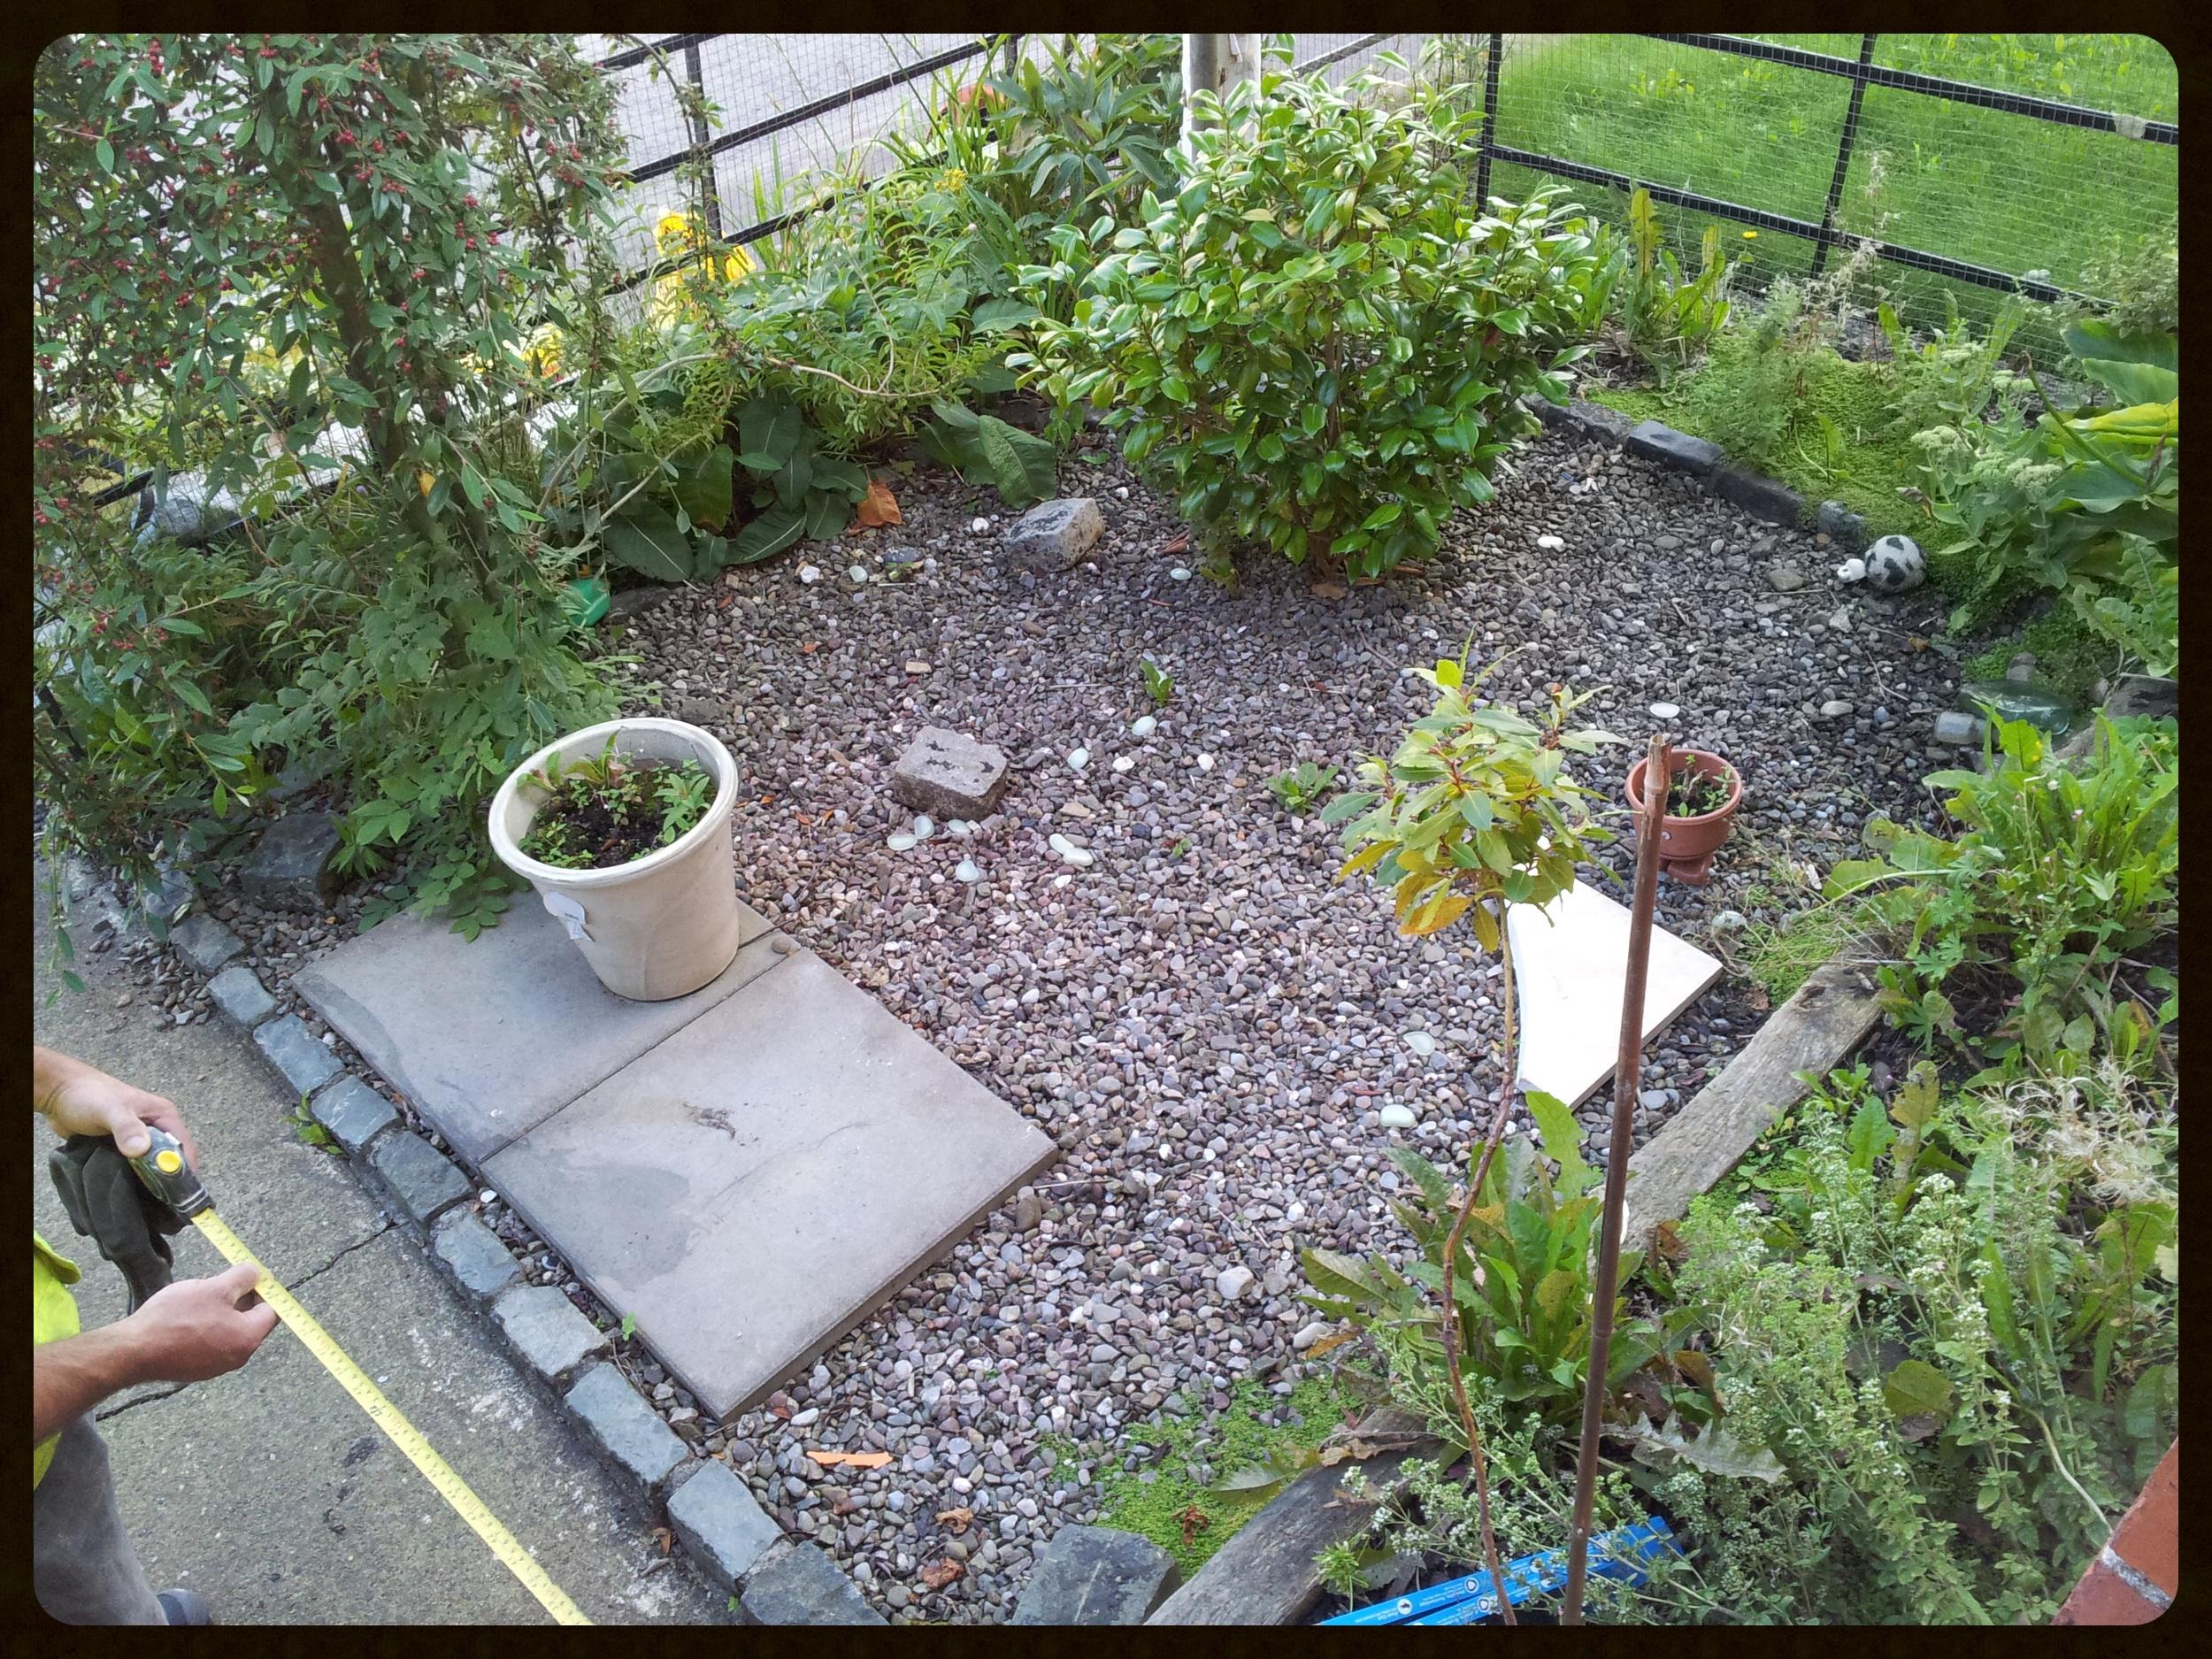 ;andscaper measuring garden